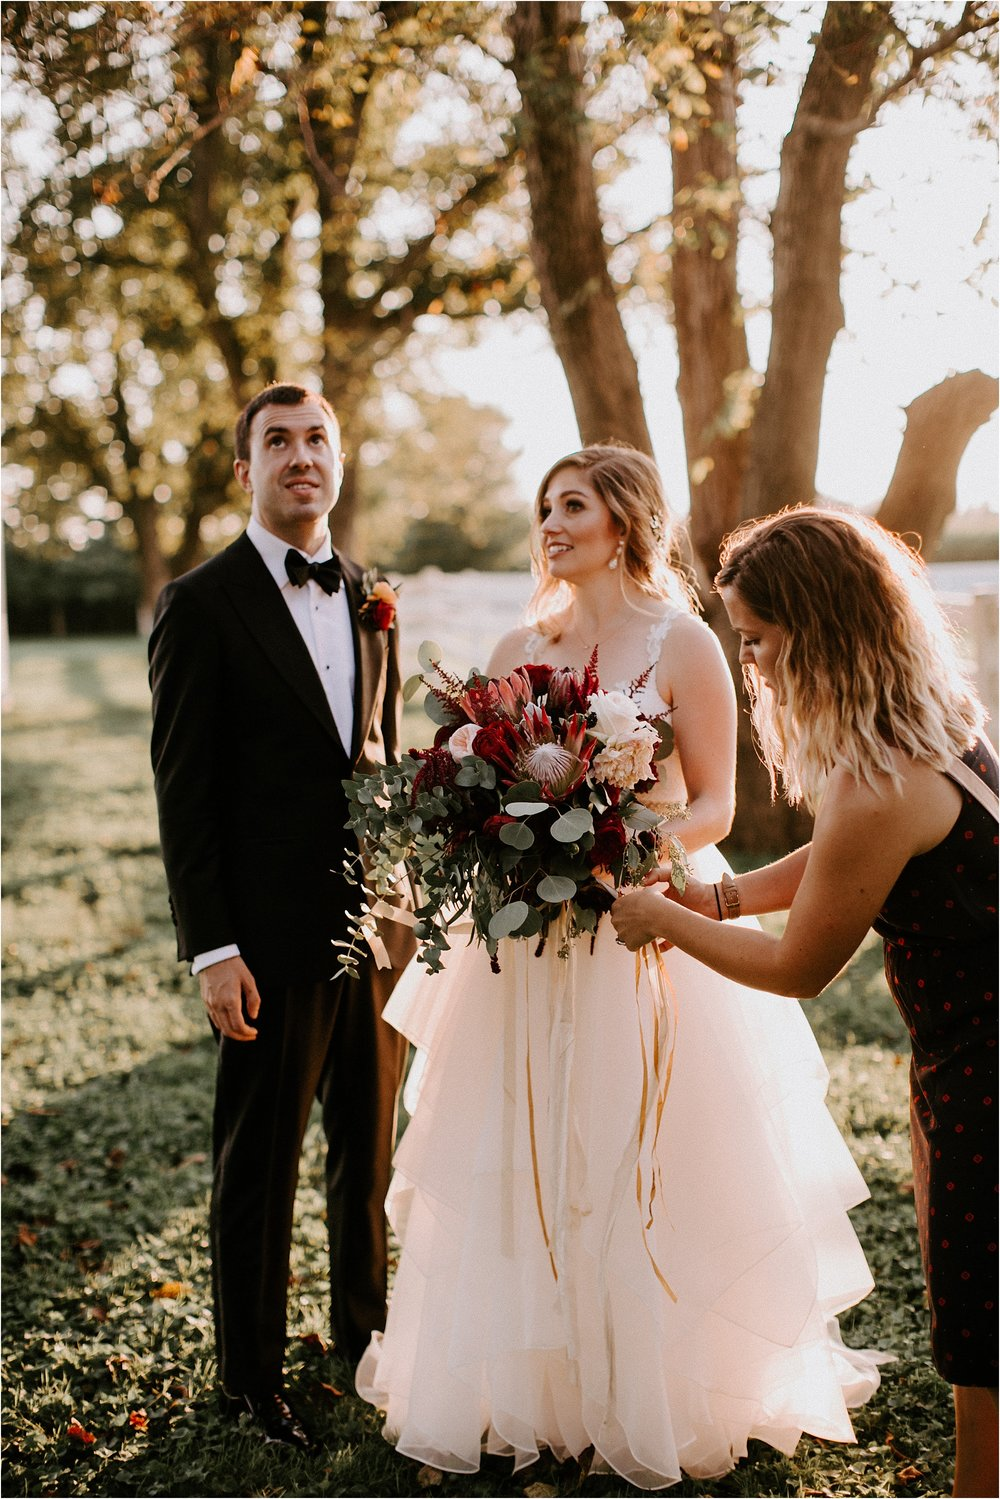 Sarah_Brookhart_PA_MD_Wedding_Photographer_0029.jpg